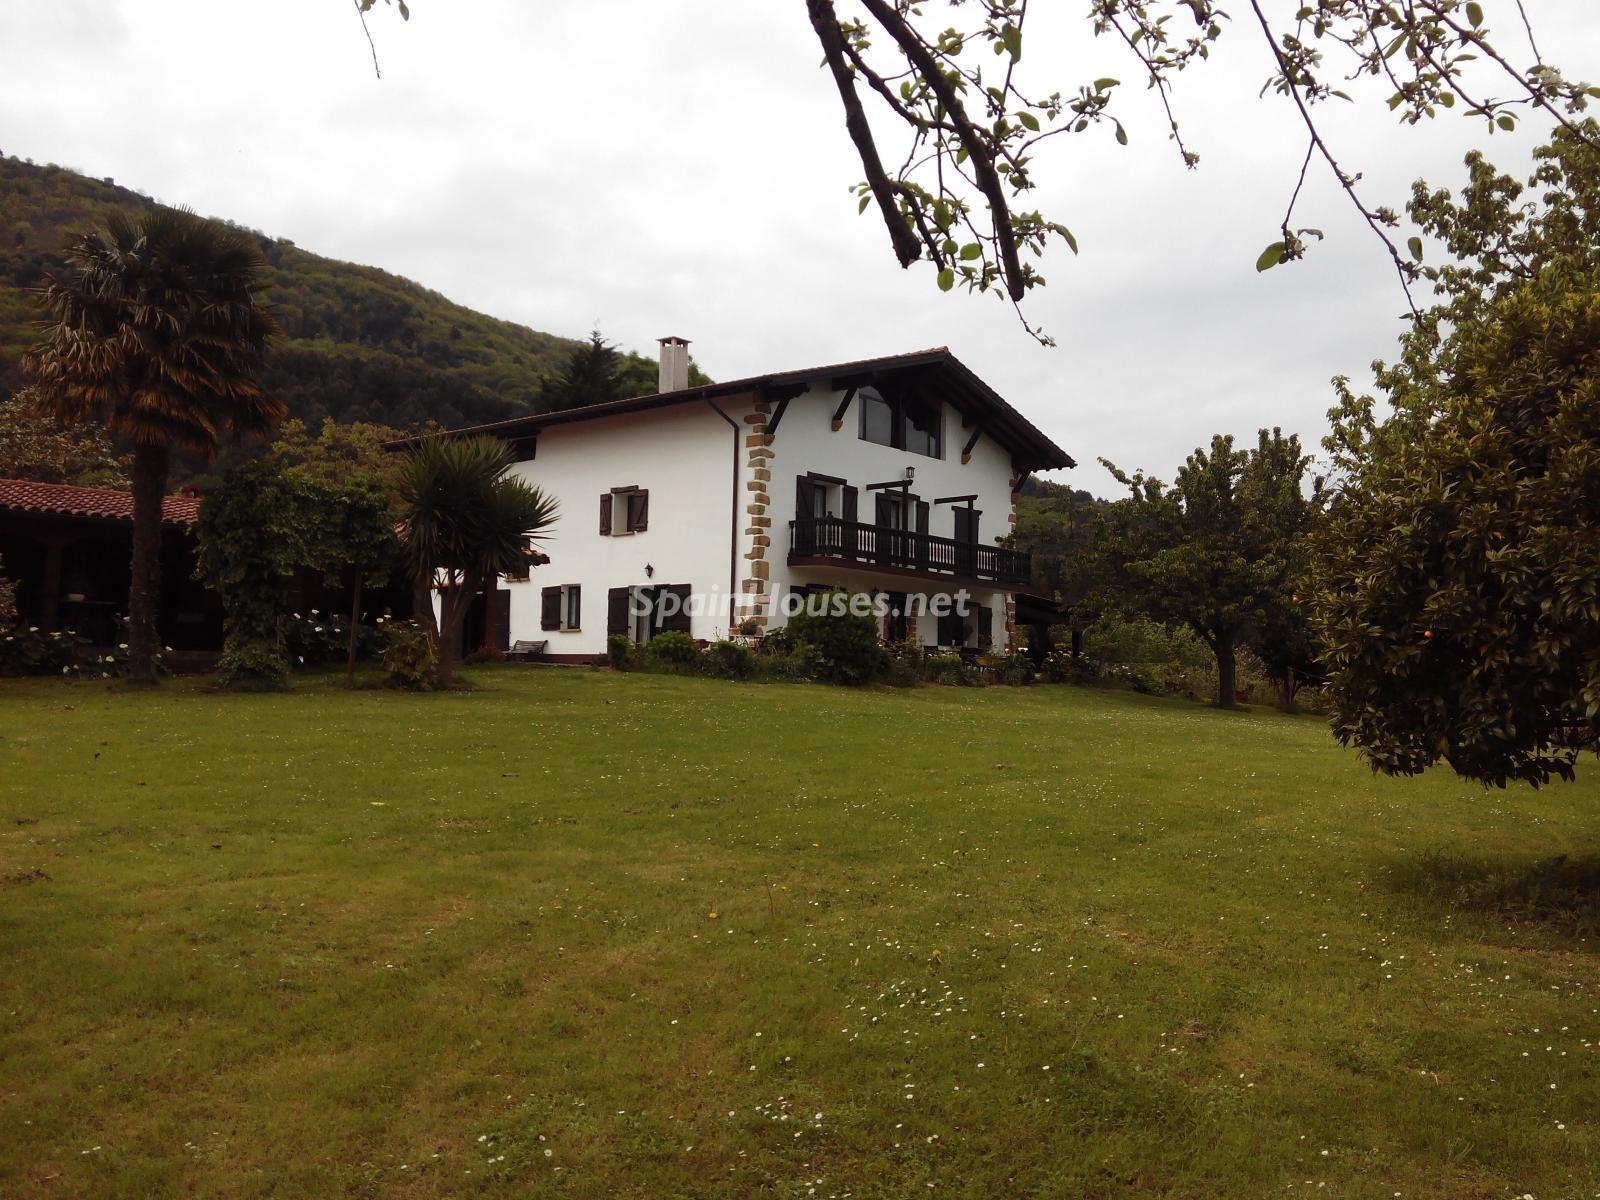 3. House for sale in Hondarribia Guipúzcoa - Charming Country House in Hondarribia, Guipúzcoa